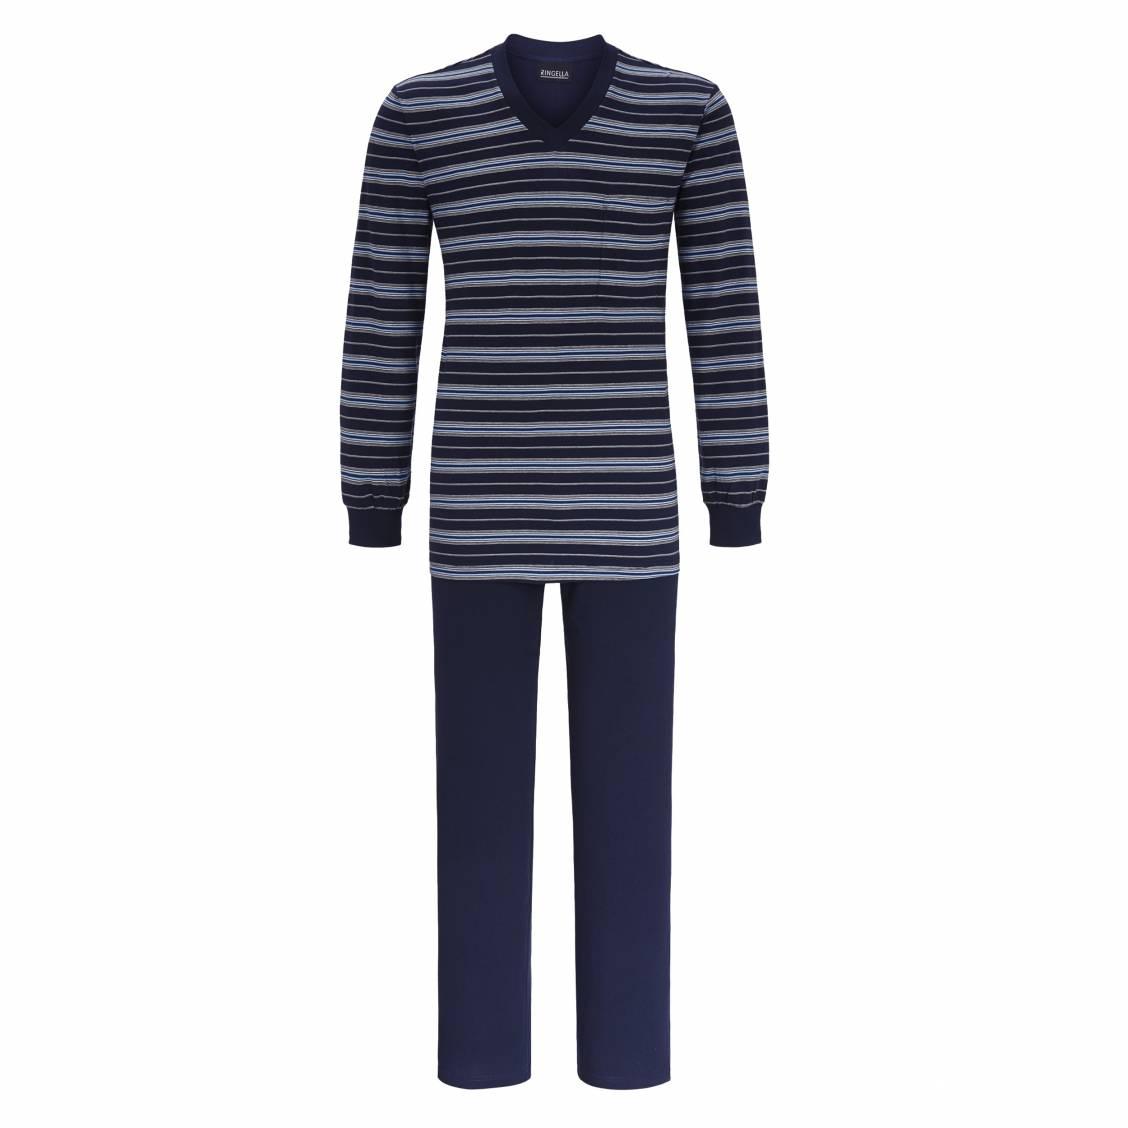 864b60b46 75183-ringella-h18-pyjama-8541218-286-night-pyjama-long-ringella-en-xxx--tee-shirt-col-v-manches-longues-bleu-marine-a-rayures-bleu-ciel-grises-et-blanches-  ...